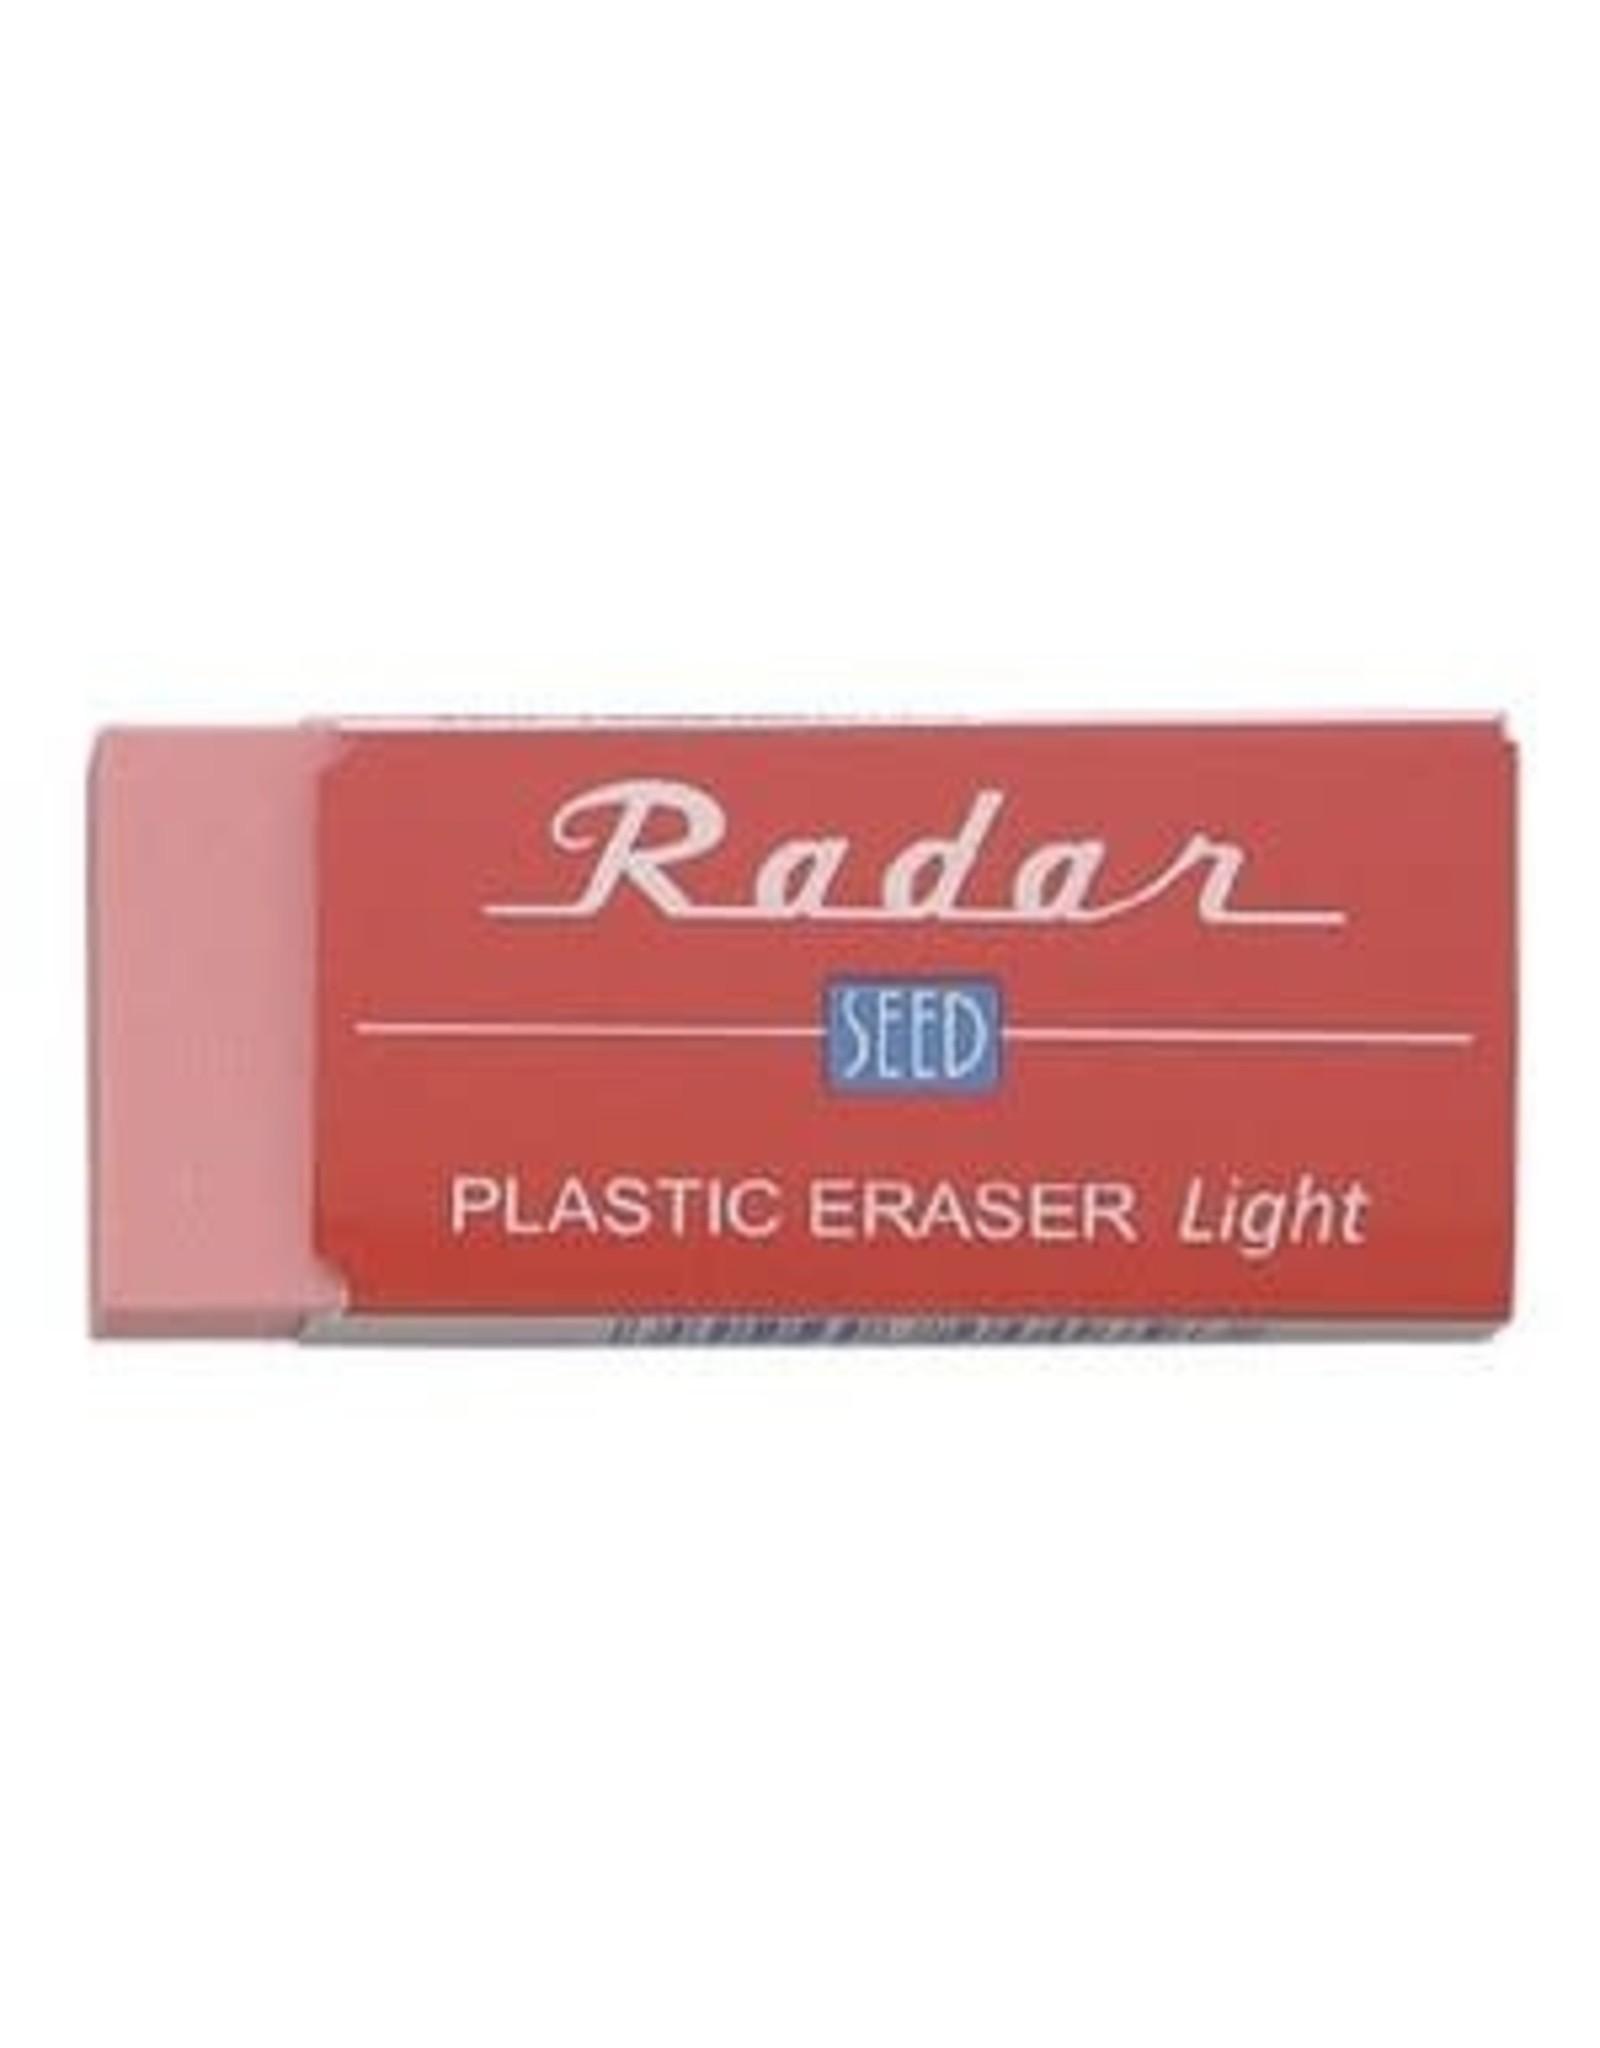 SEED SEED COLORFUL RADAR LIGHT100 RED